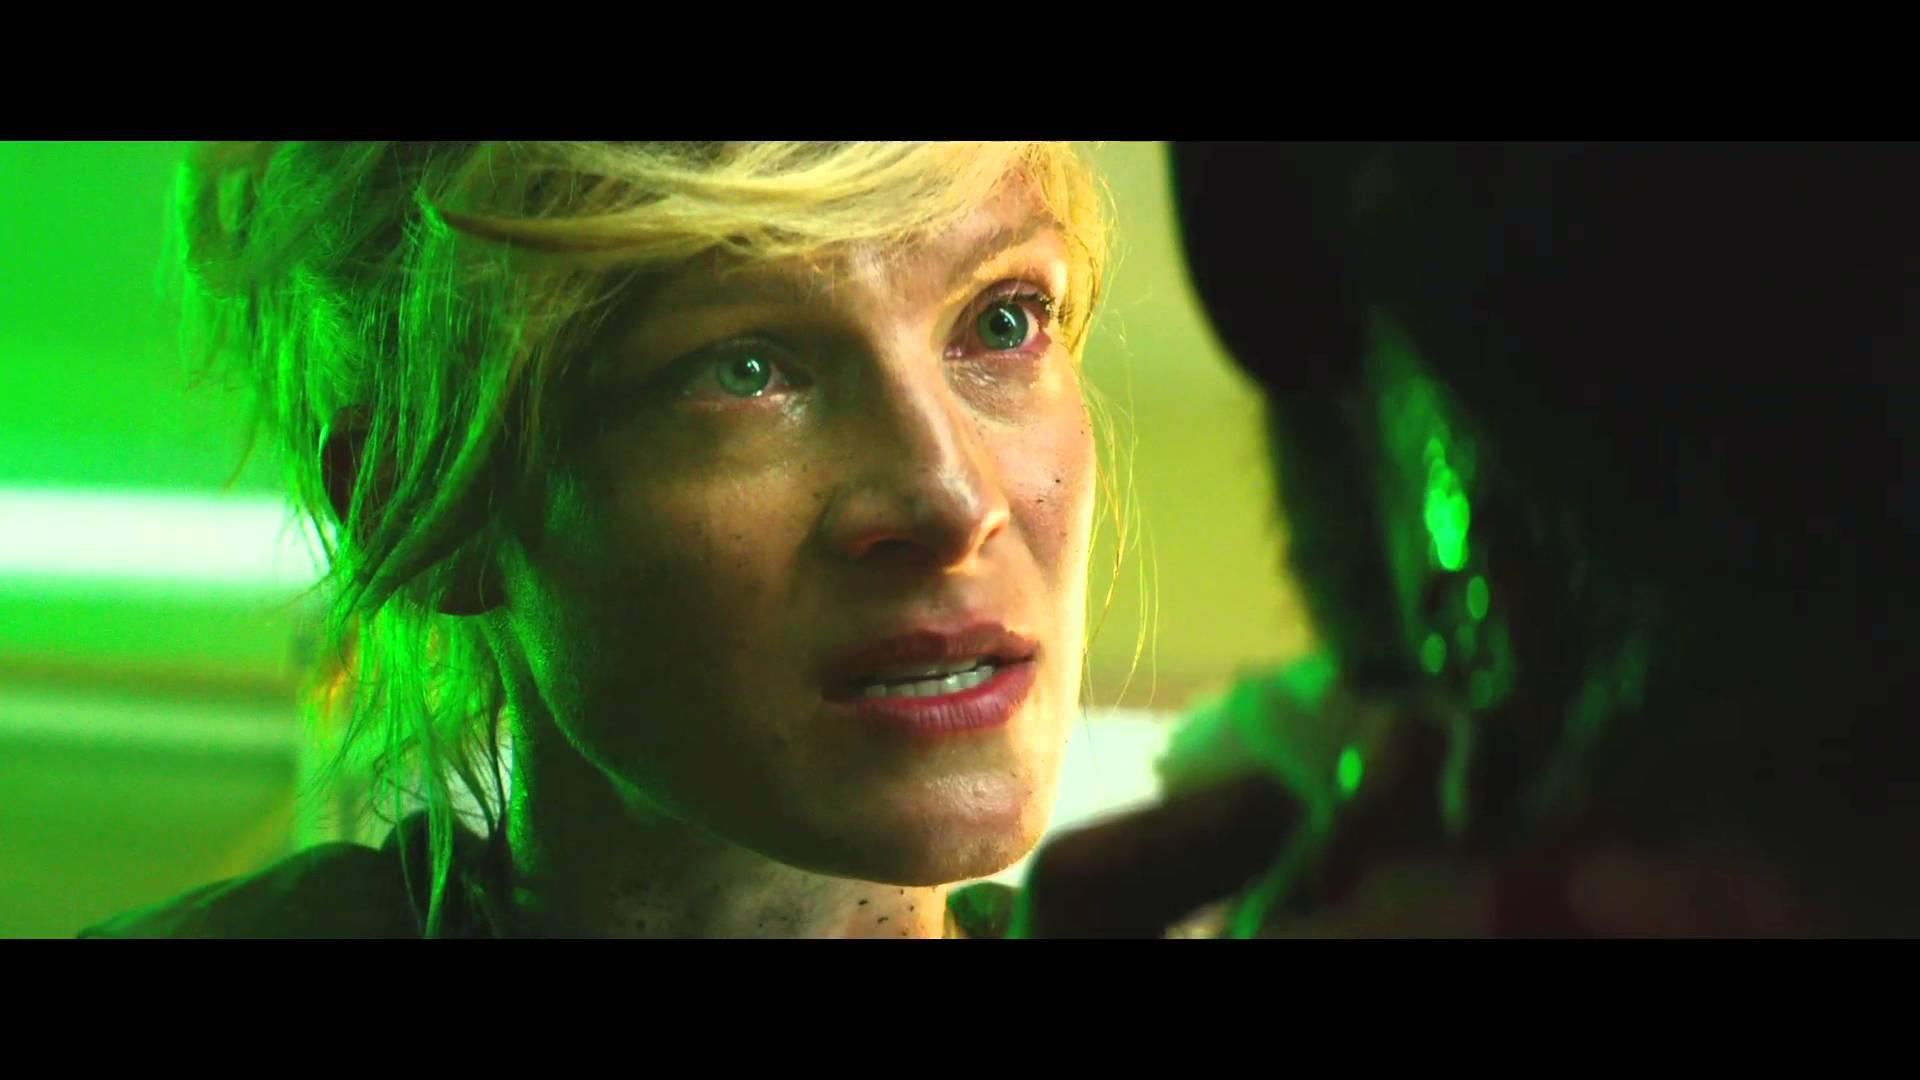 13 Hours: The Secret Soldiers of Benghazi   Warriors   Paramount Pictures UK